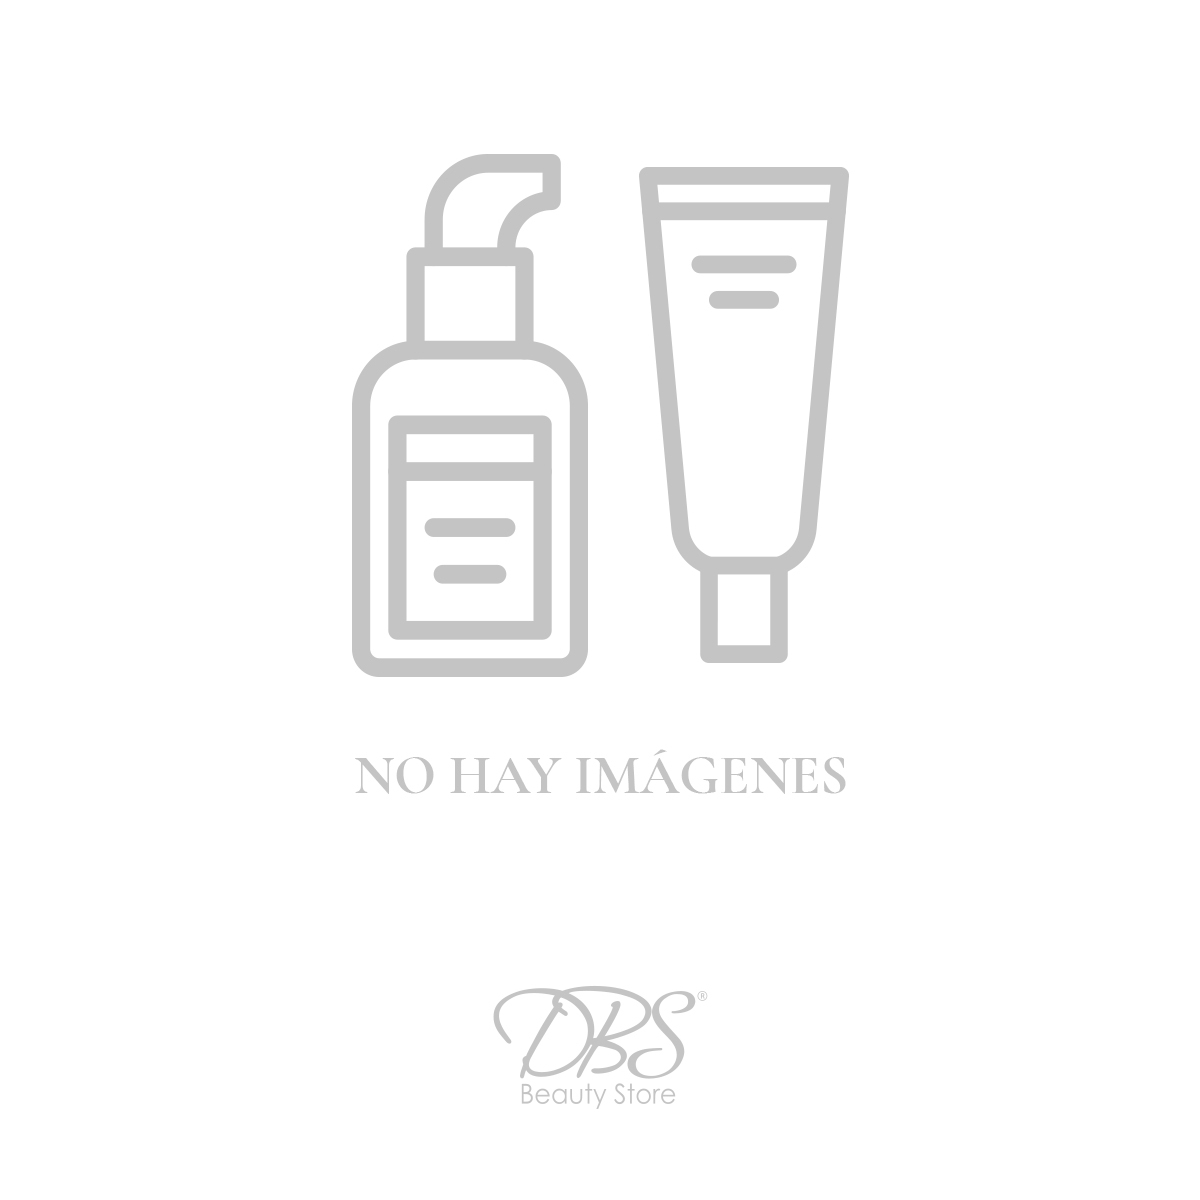 Tripack Antioxidante Shampoo + Acondicionador + Tratamiento